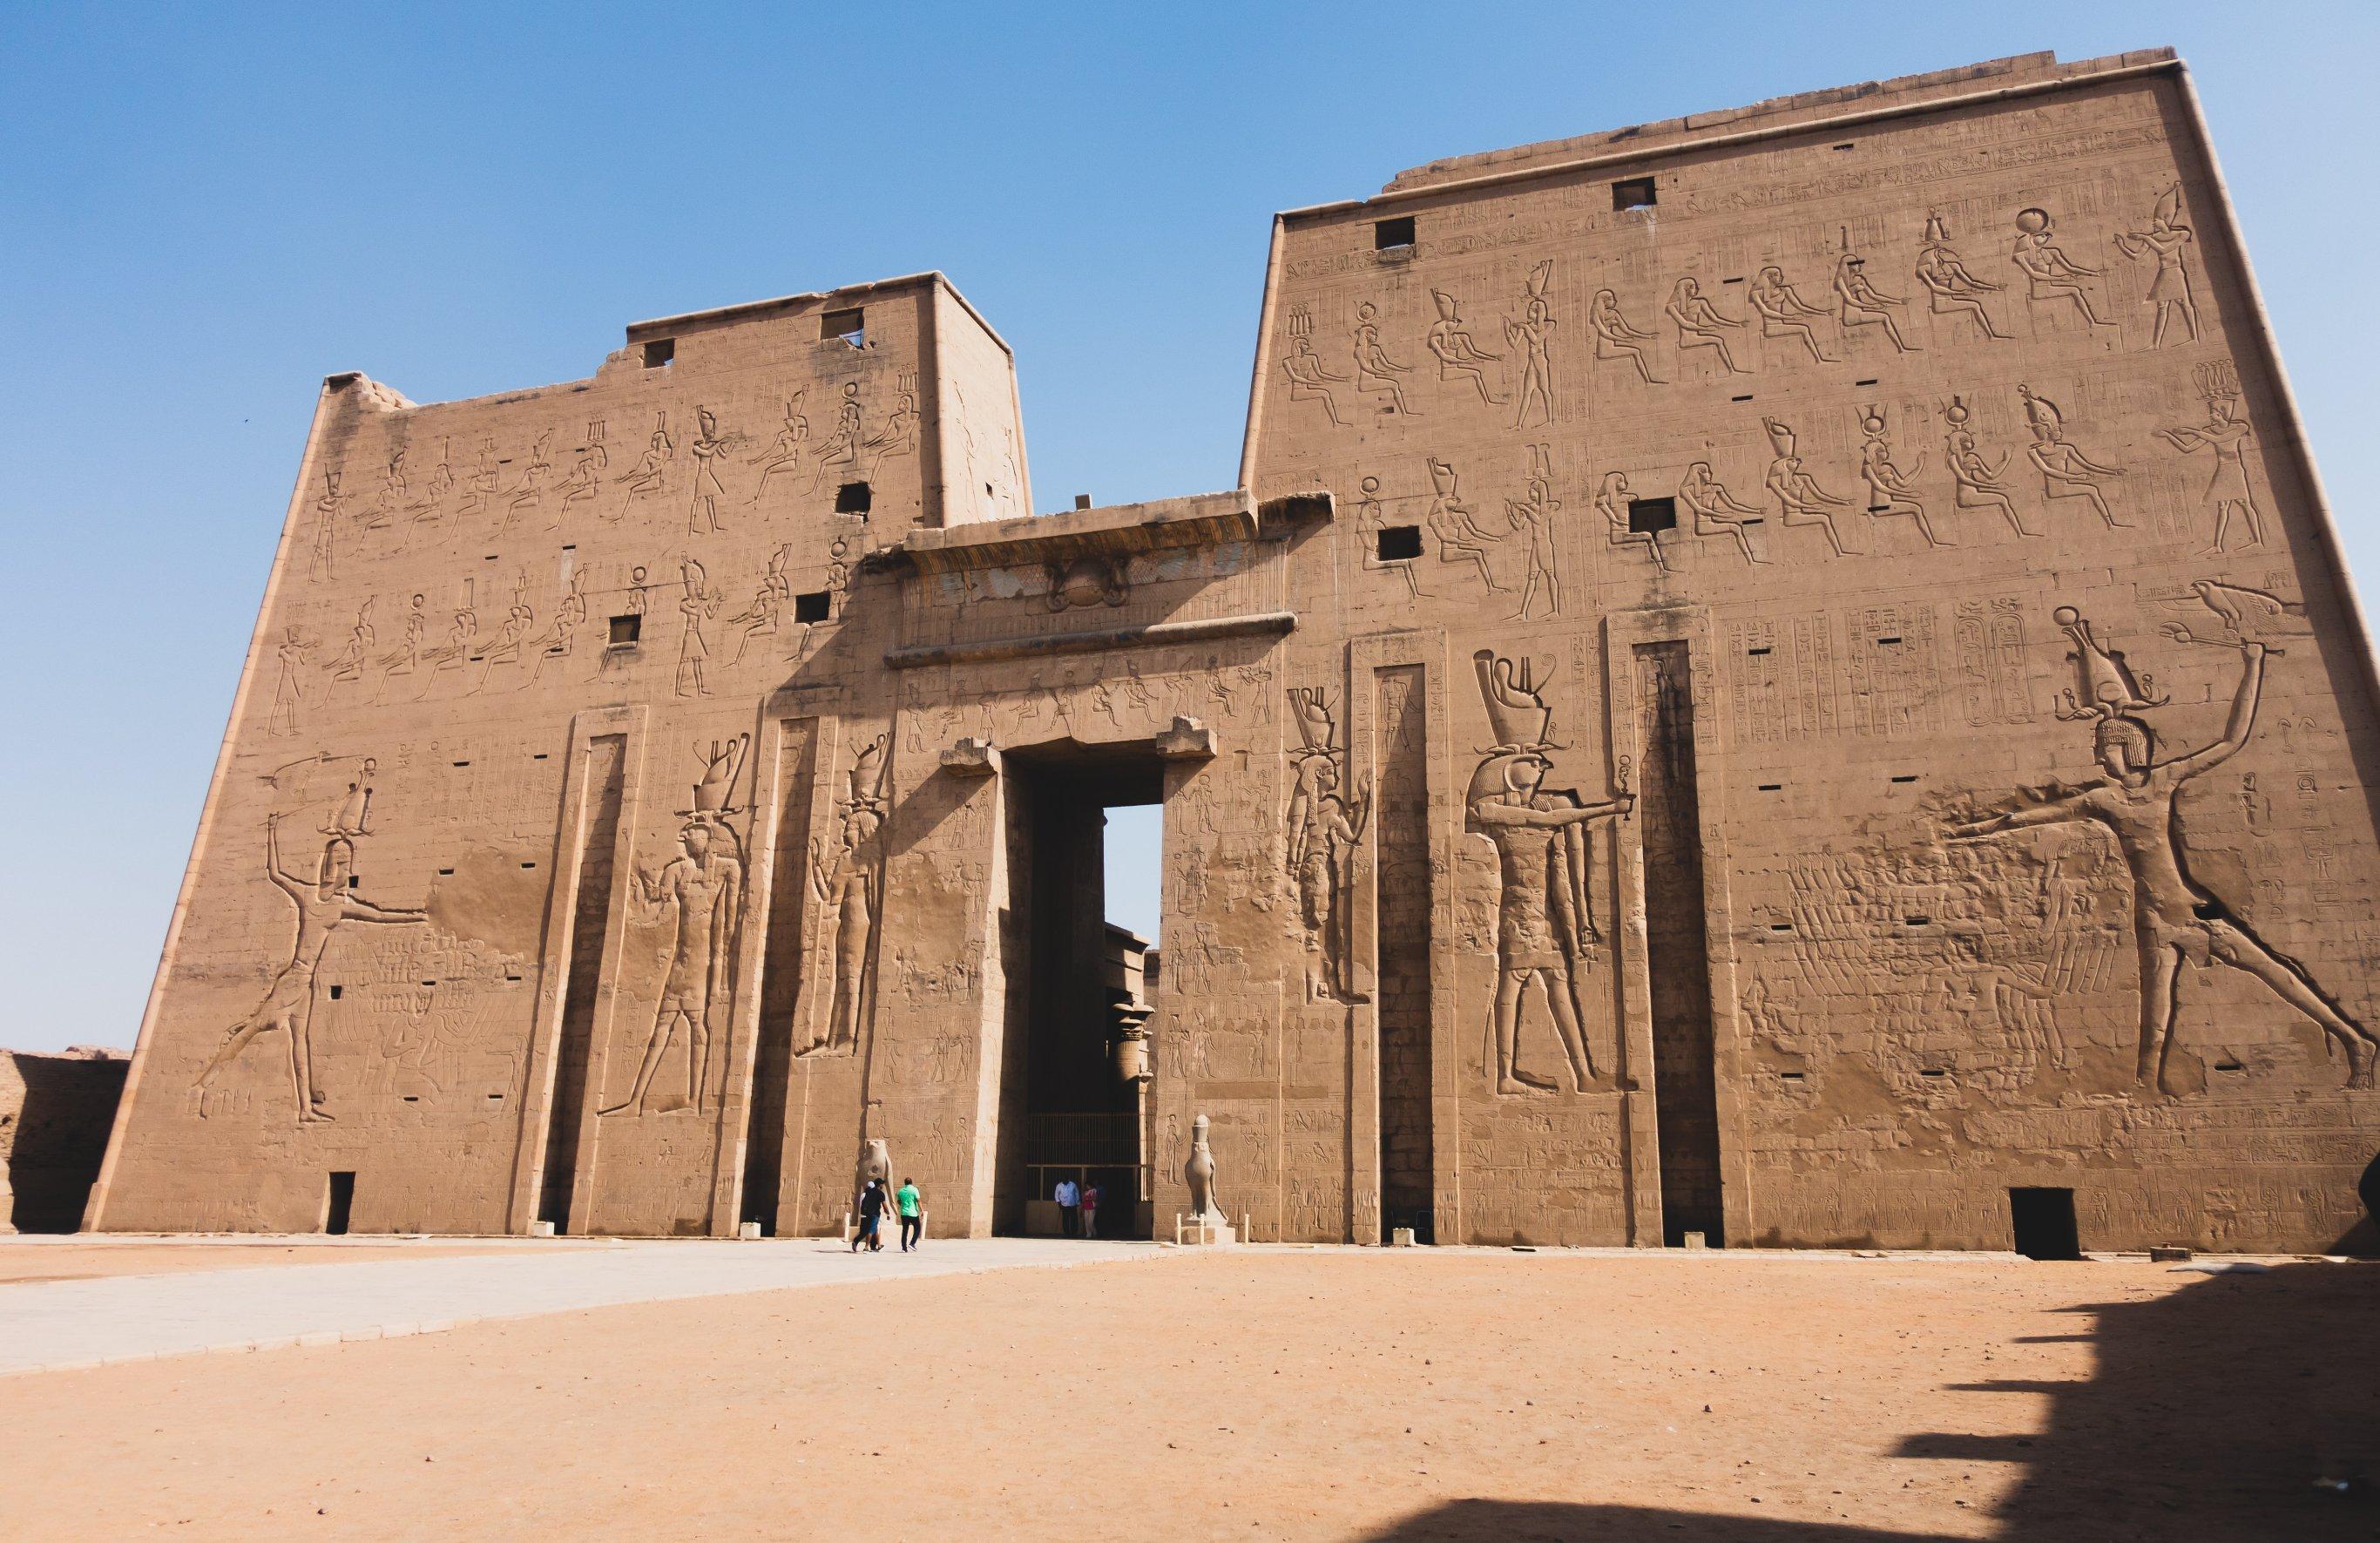 9-Day Cairo, Alexandria, Aswan, Luxor & Hurghada - Egypt Itinerary